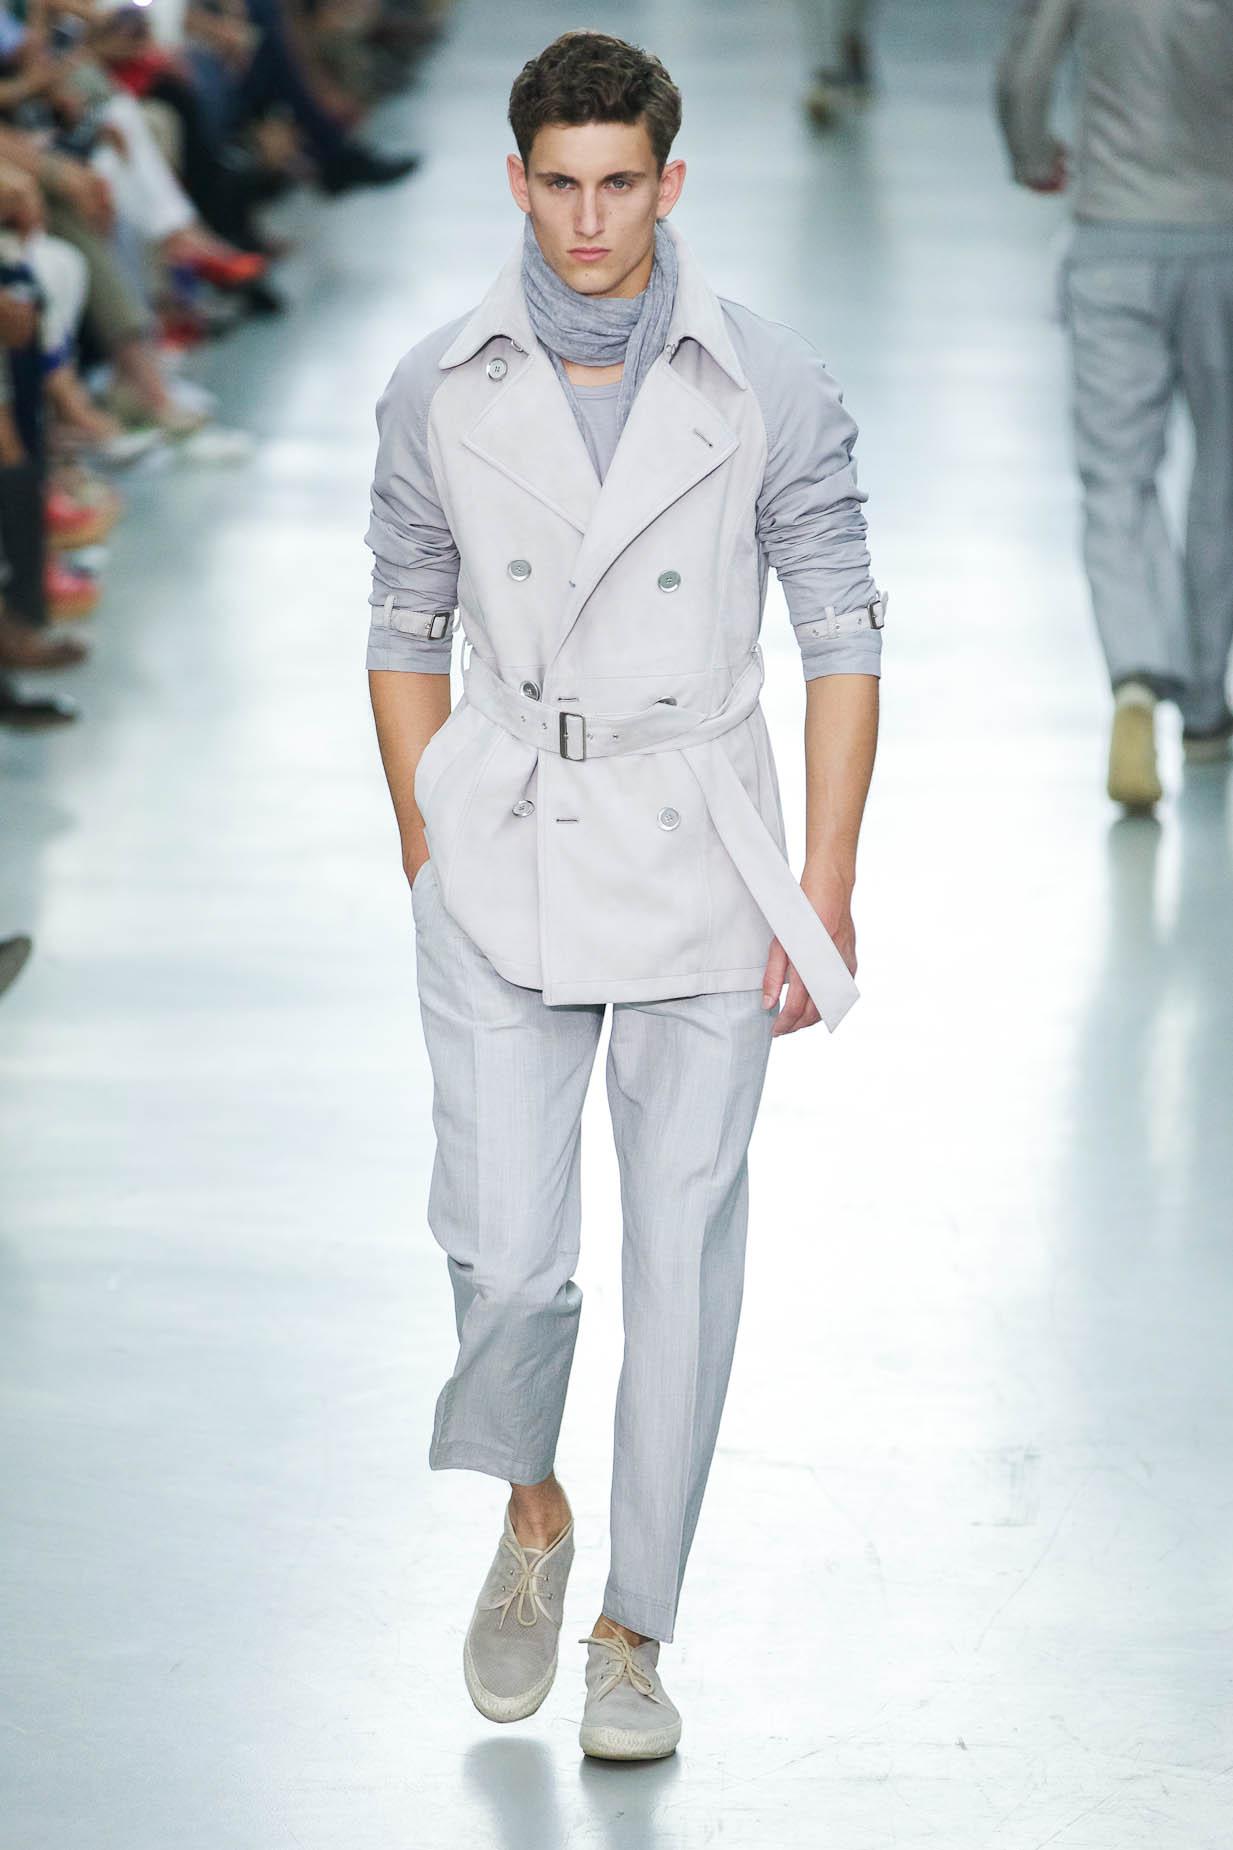 Summer 2013 Fashion Show